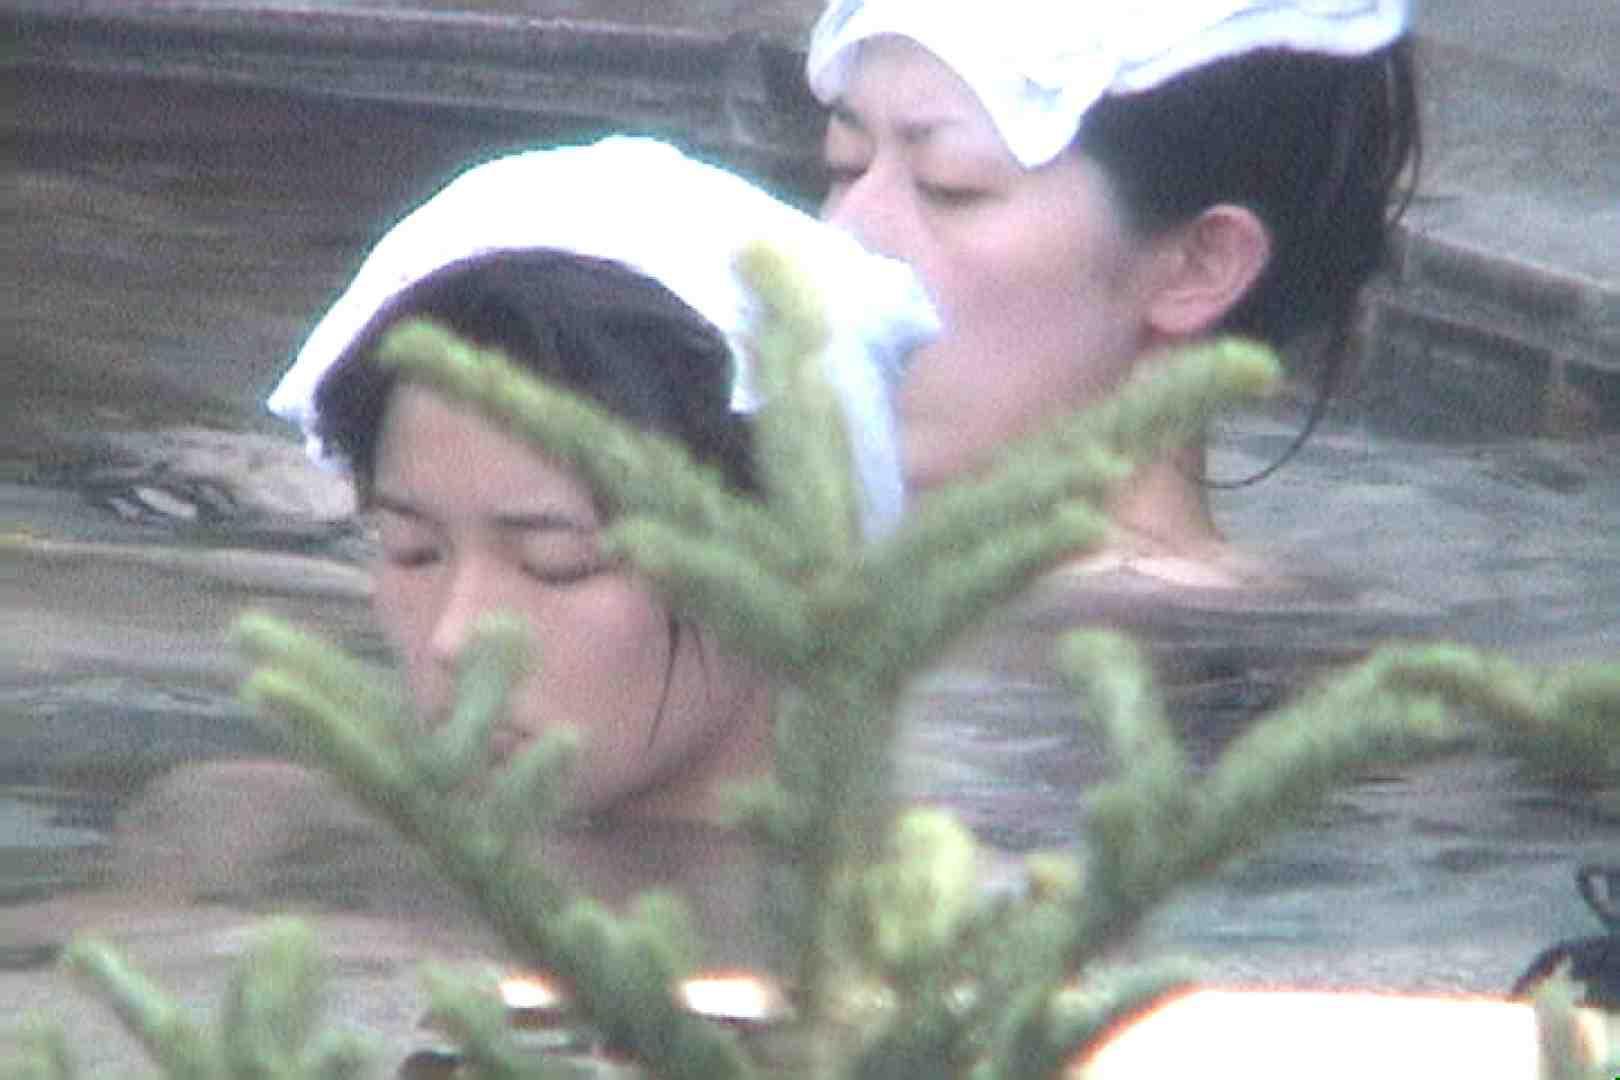 Aquaな露天風呂Vol.80【VIP限定】 盗撮大放出 濡れ場動画紹介 73連発 53